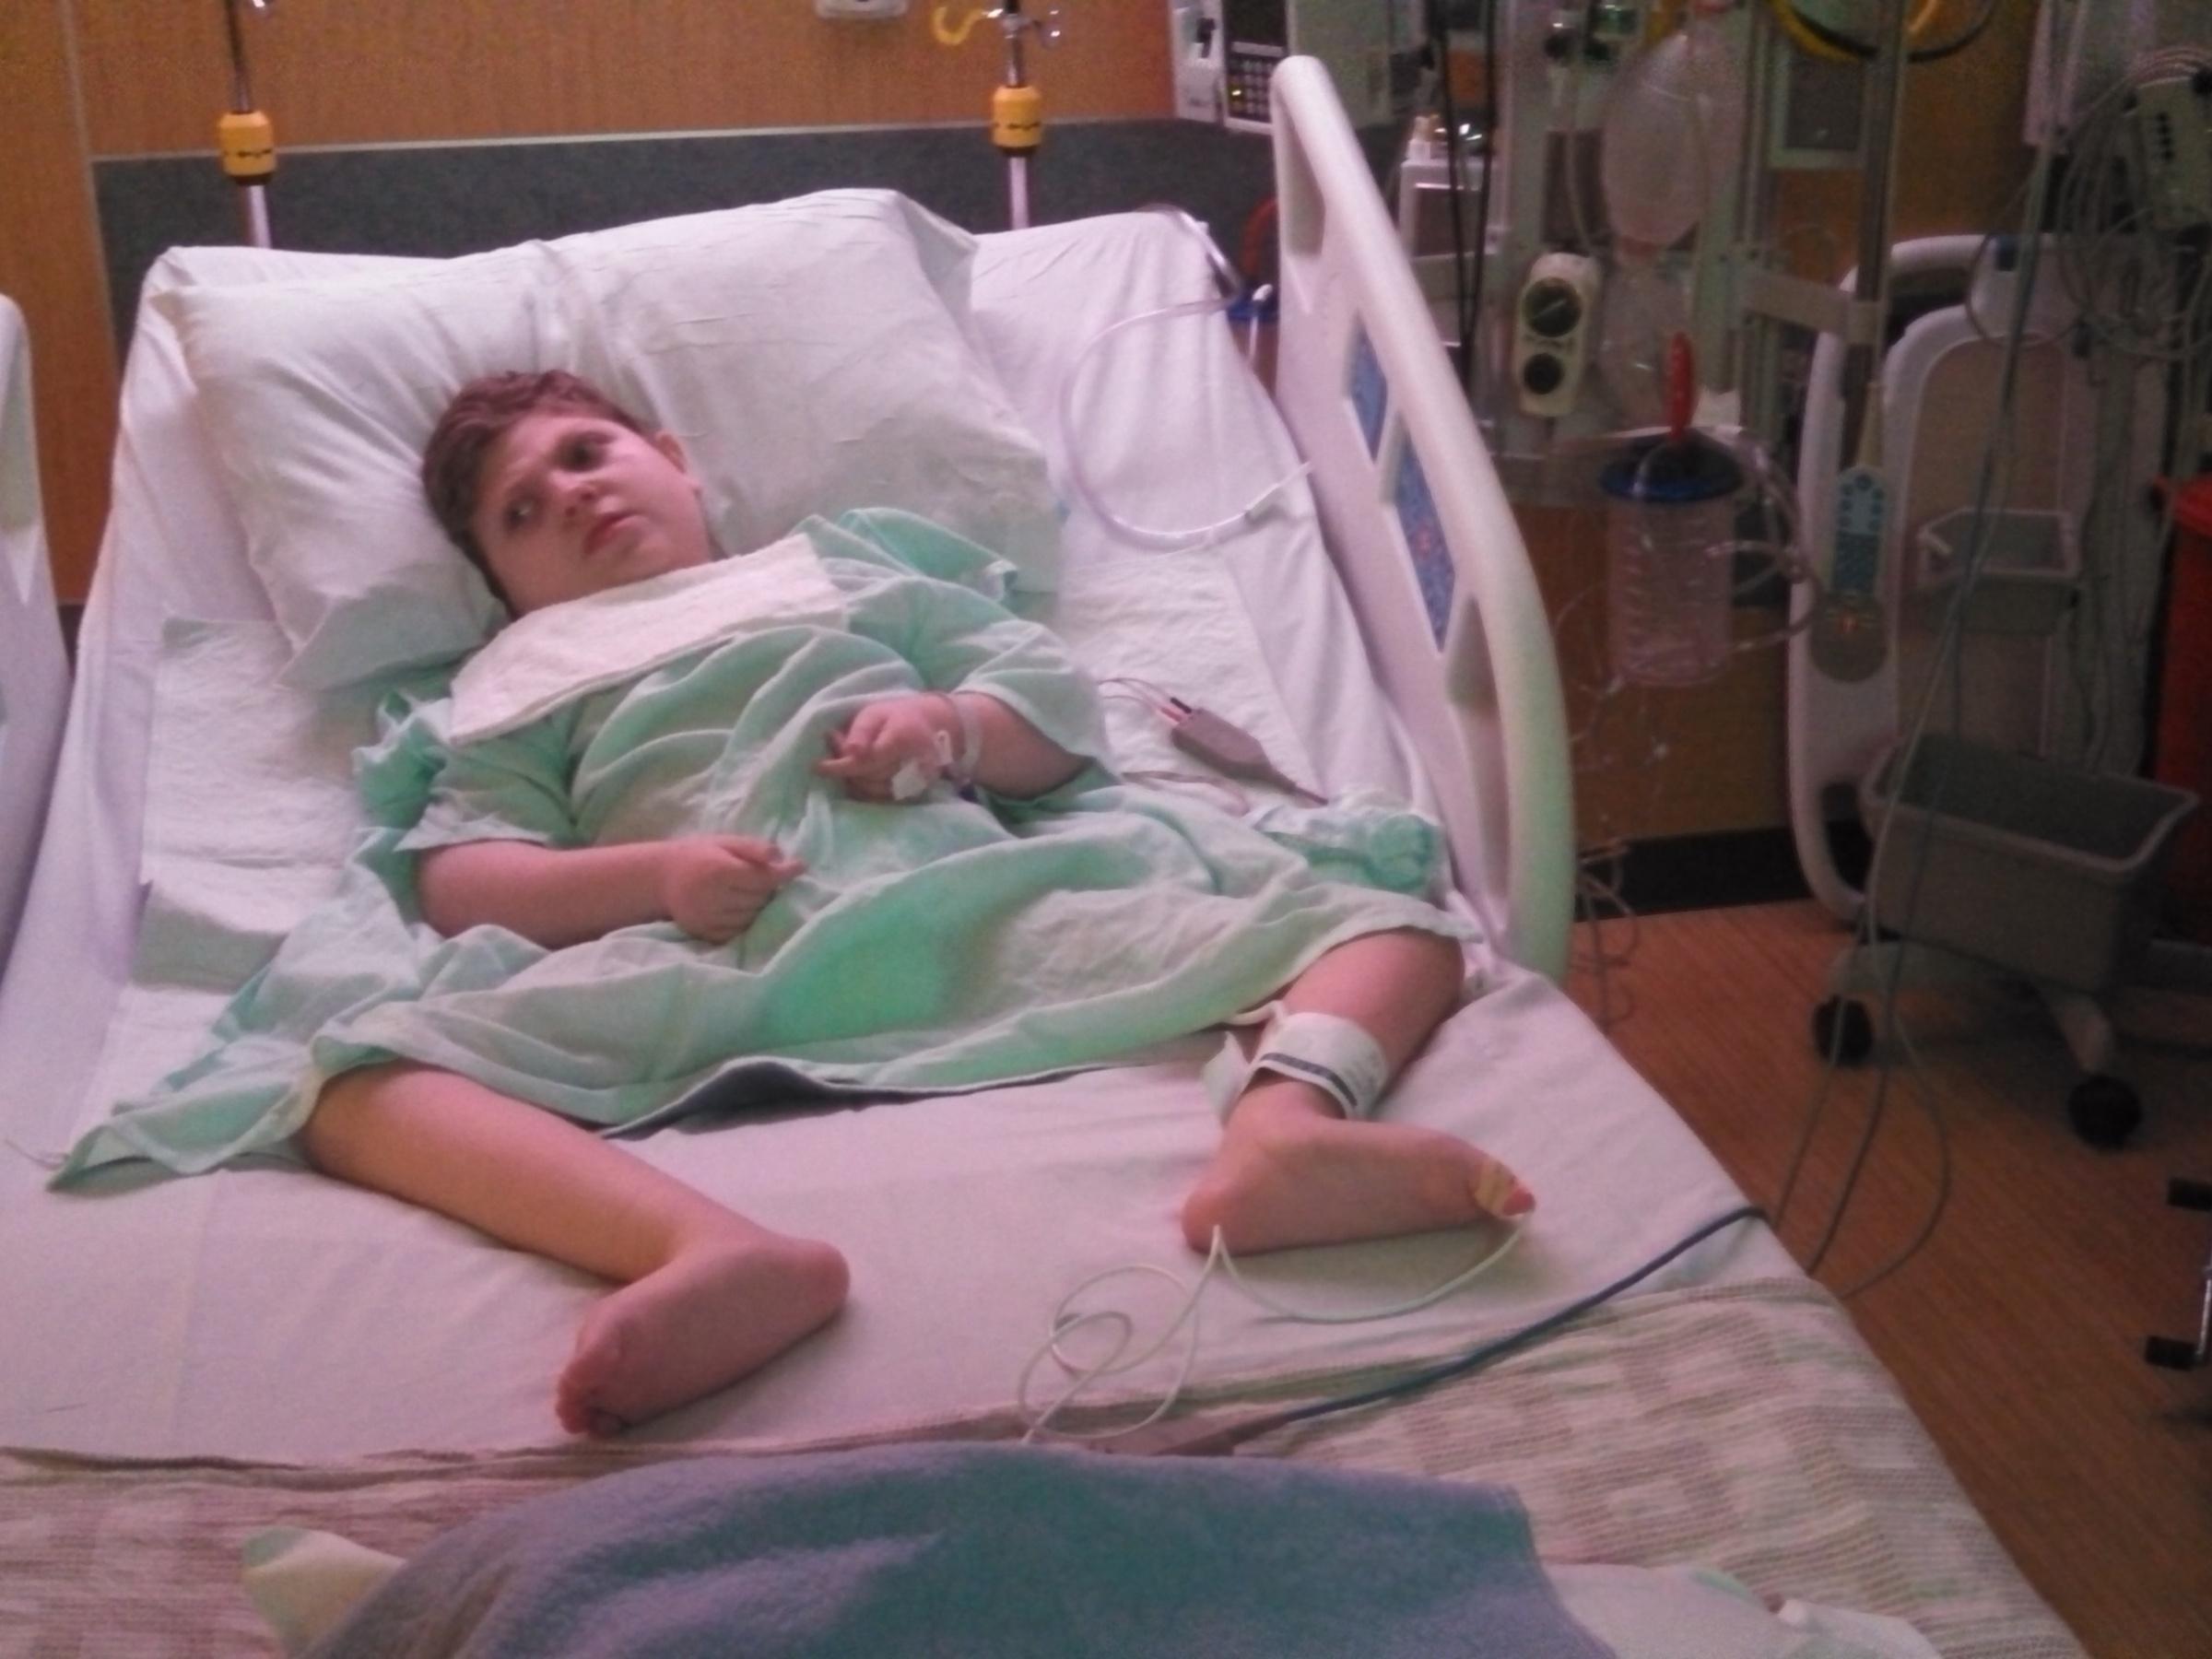 J.P. hospitalized